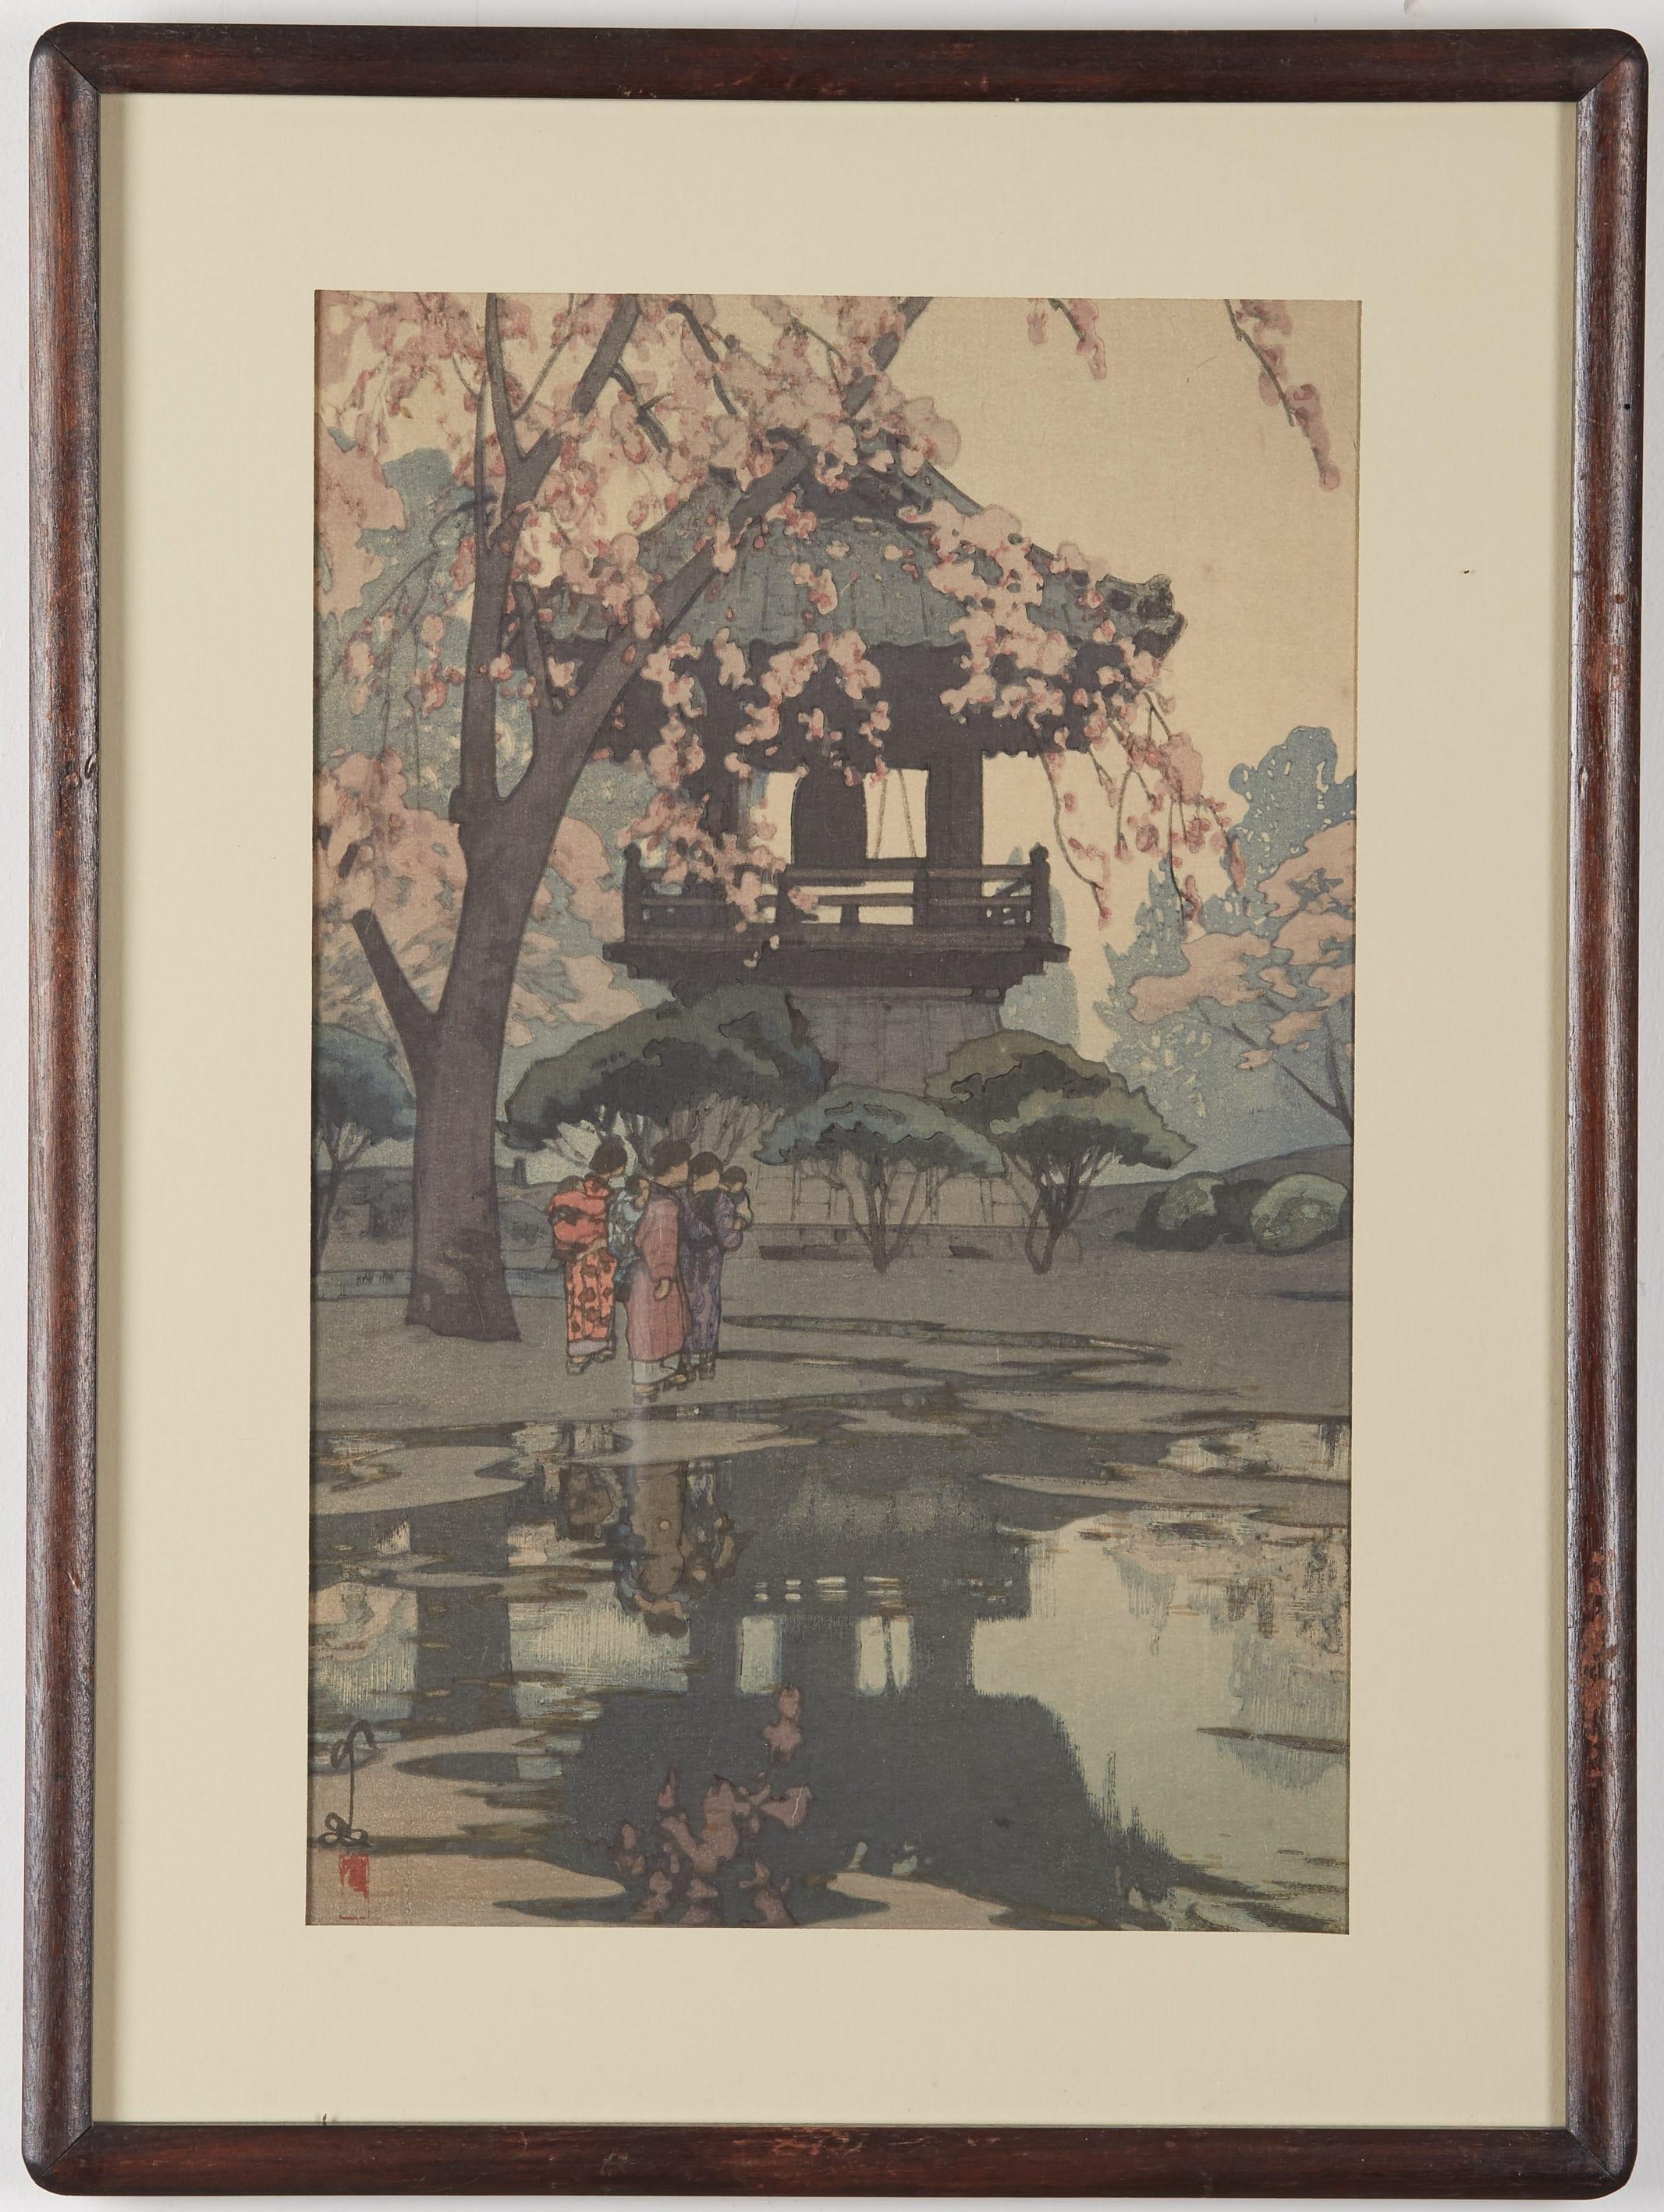 Lot 094: Hiroshi Yoshida In a Temple Yard Woodblock Print